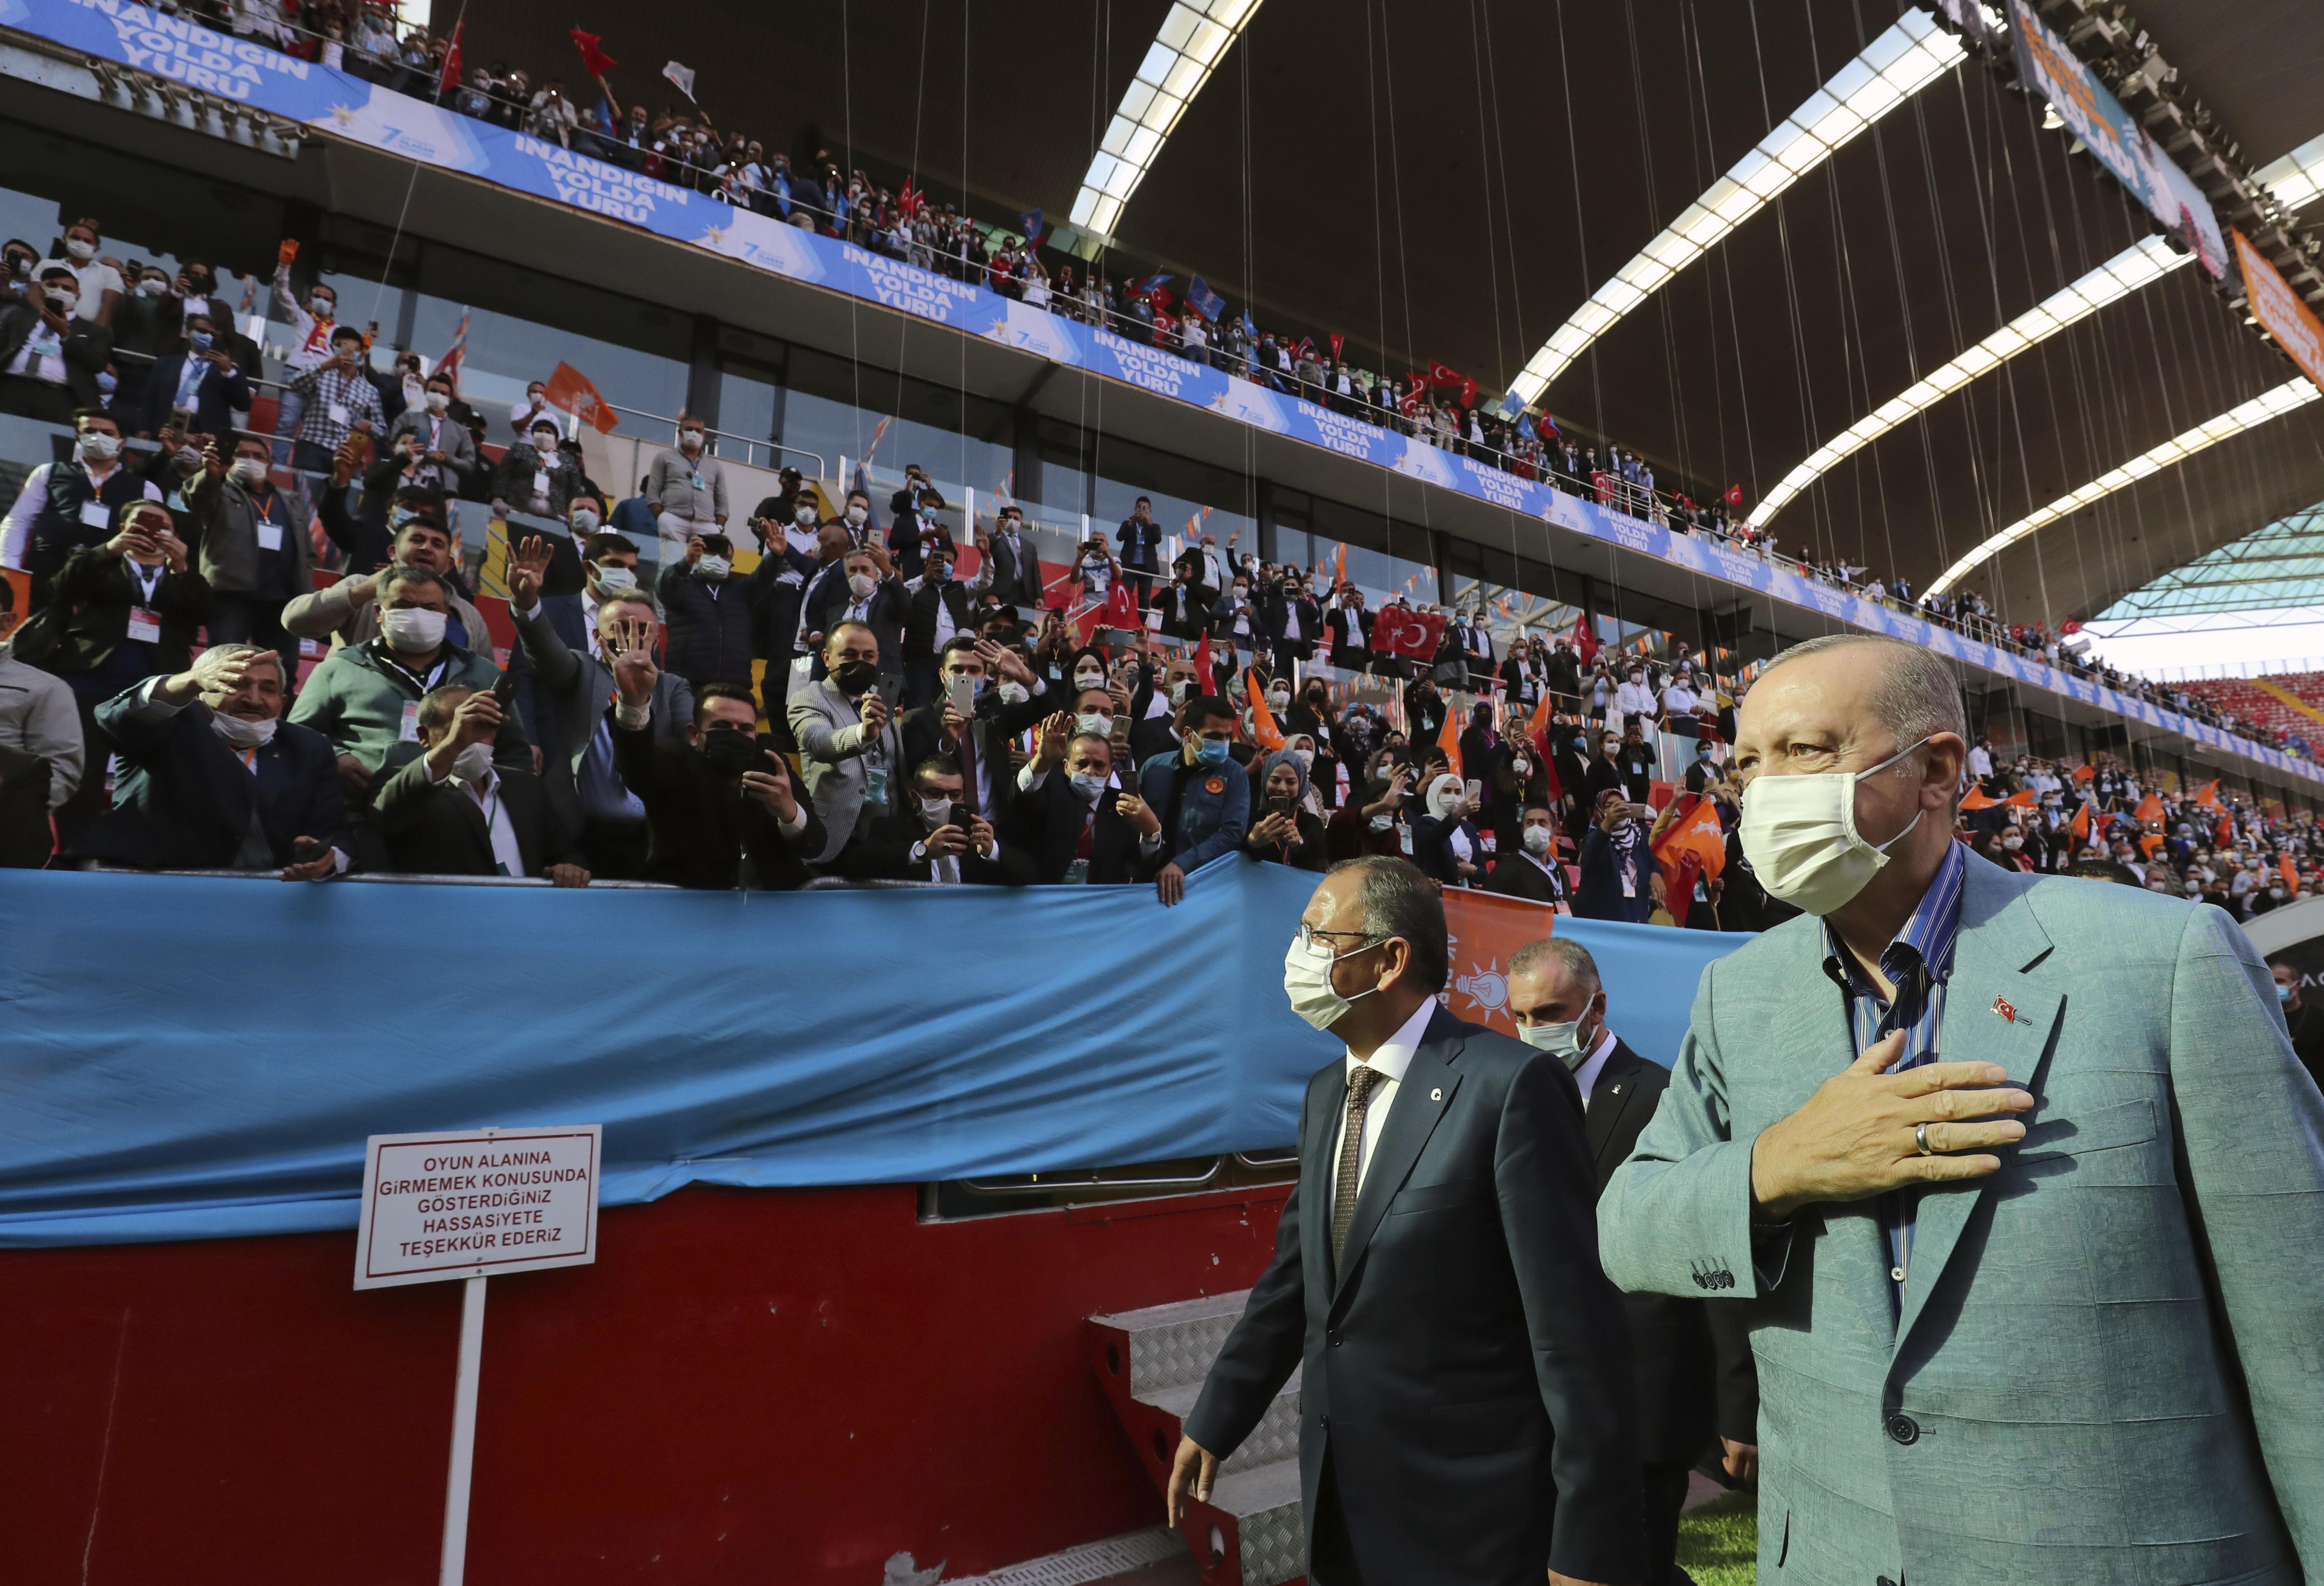 France reacts after Erdogan questions Macrons mental health